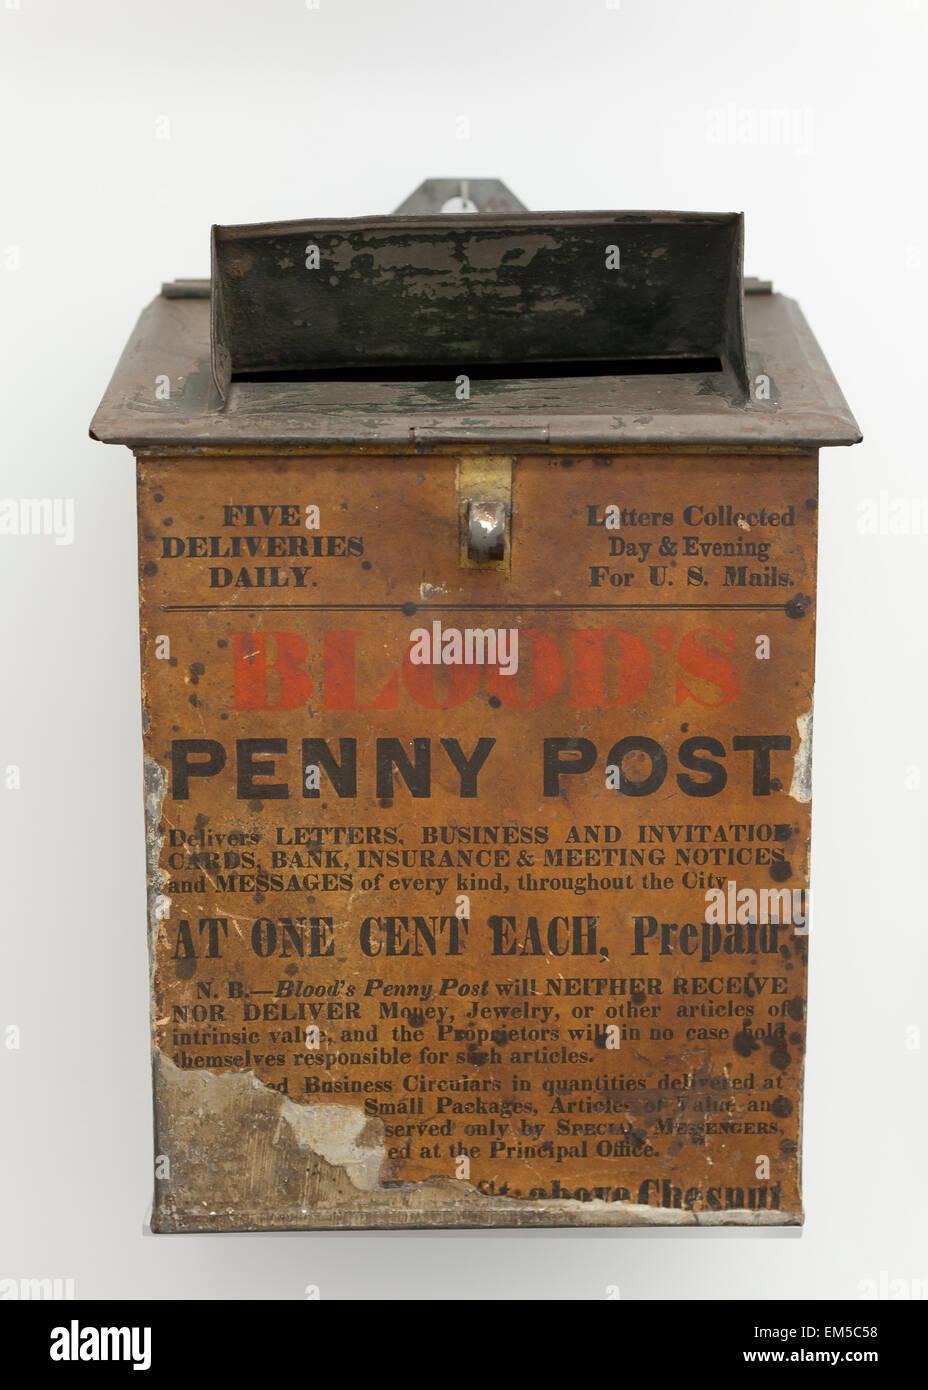 Blood's Penny Post mailbox, circa 1800s - USA - Stock Image